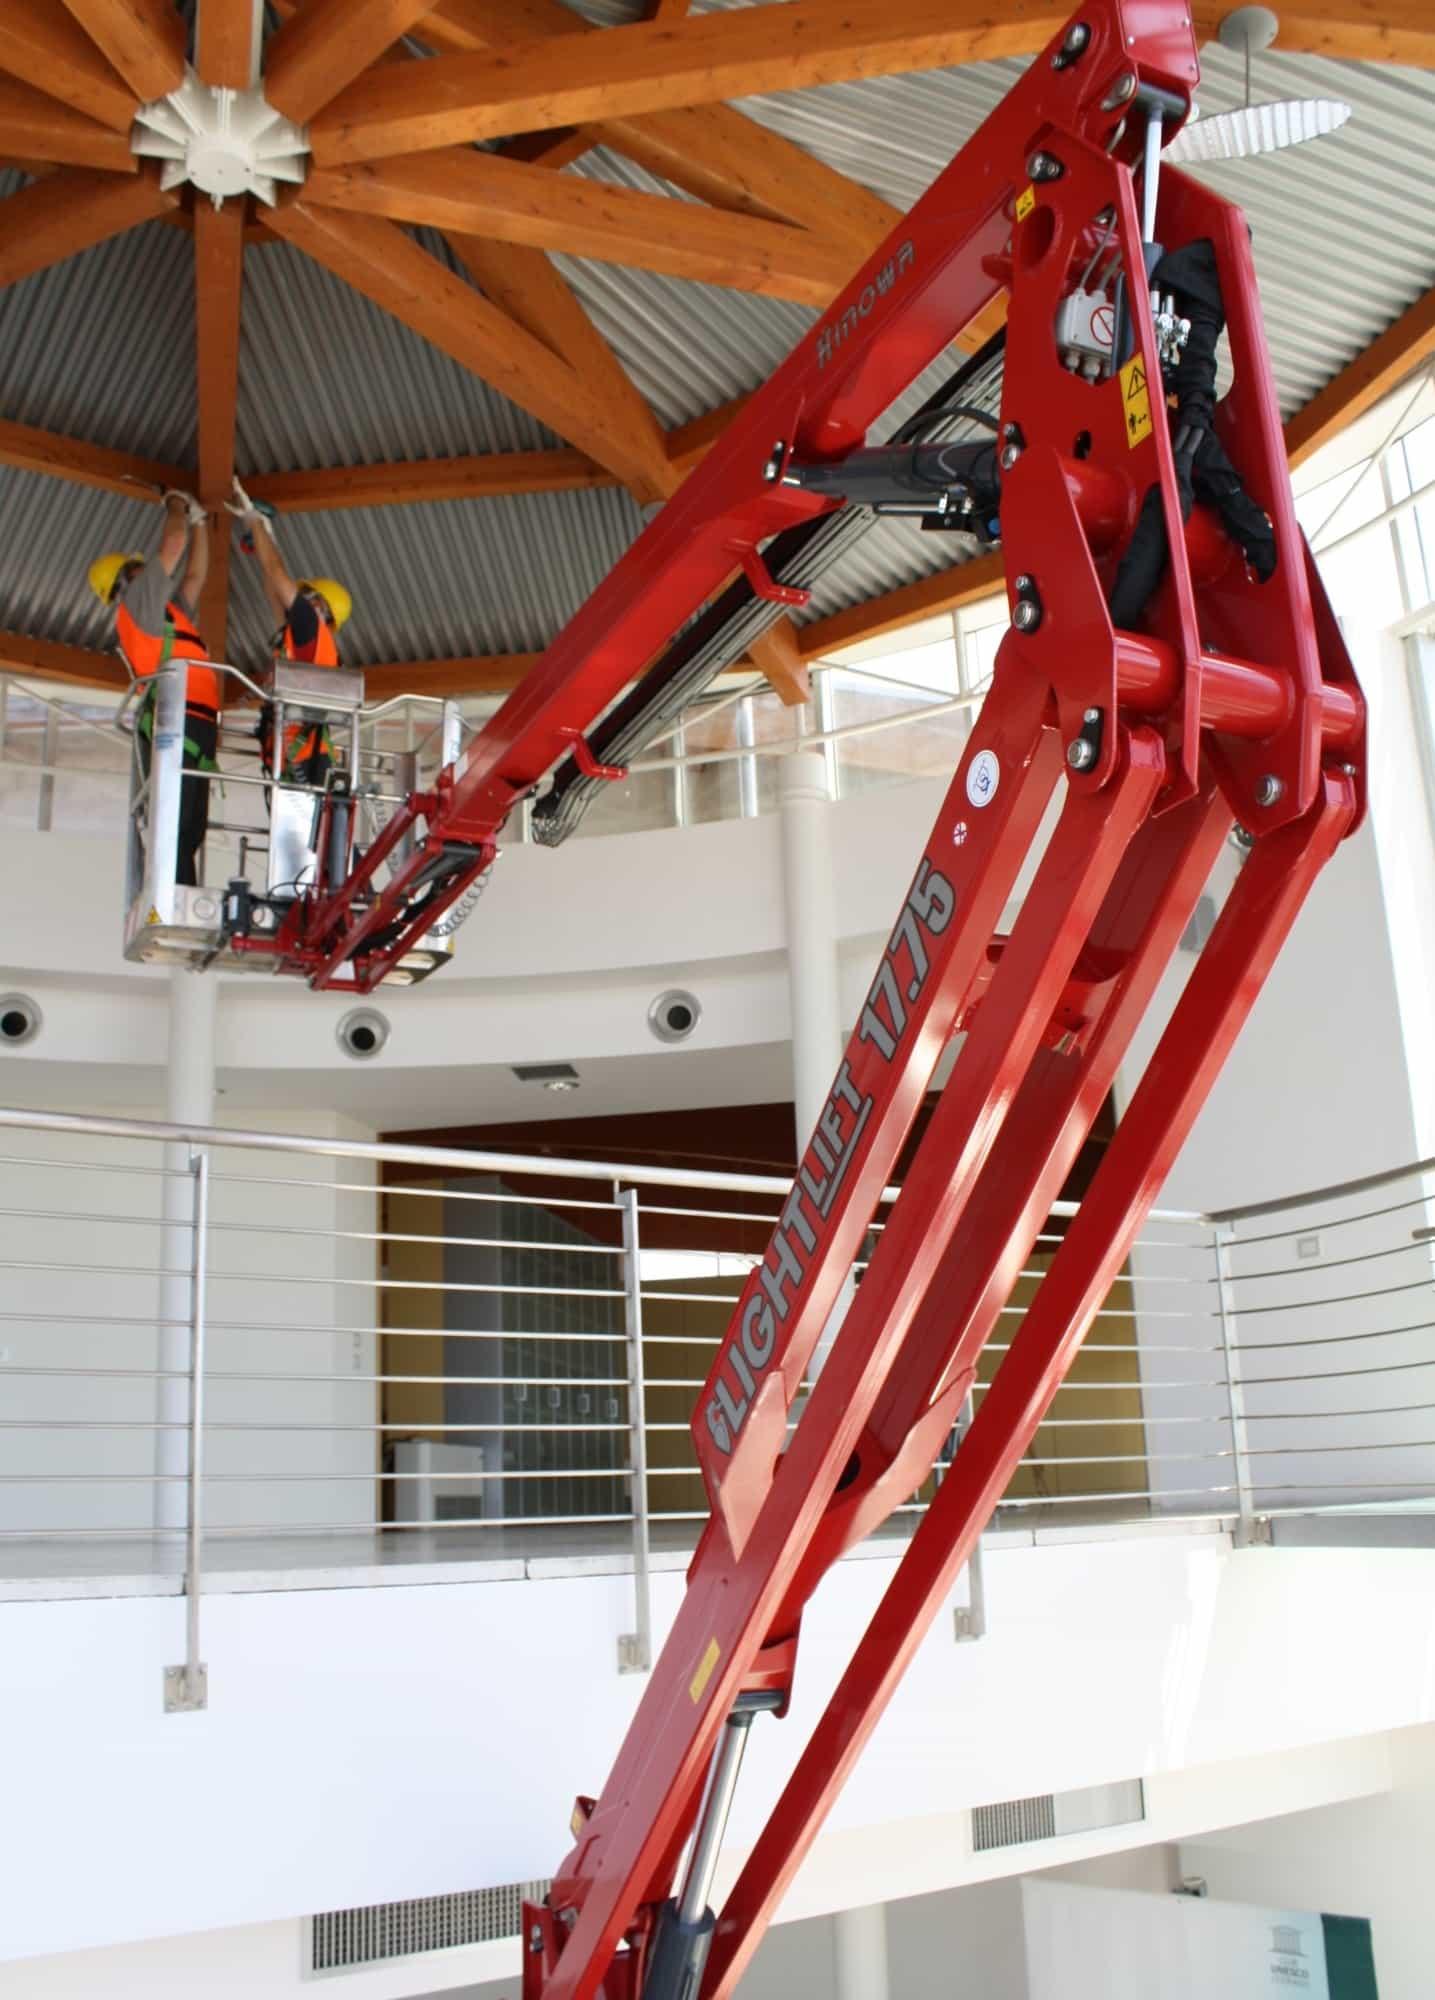 Spider Lift Rental - Hinowa Light Lift 17.75 IIIS Performance